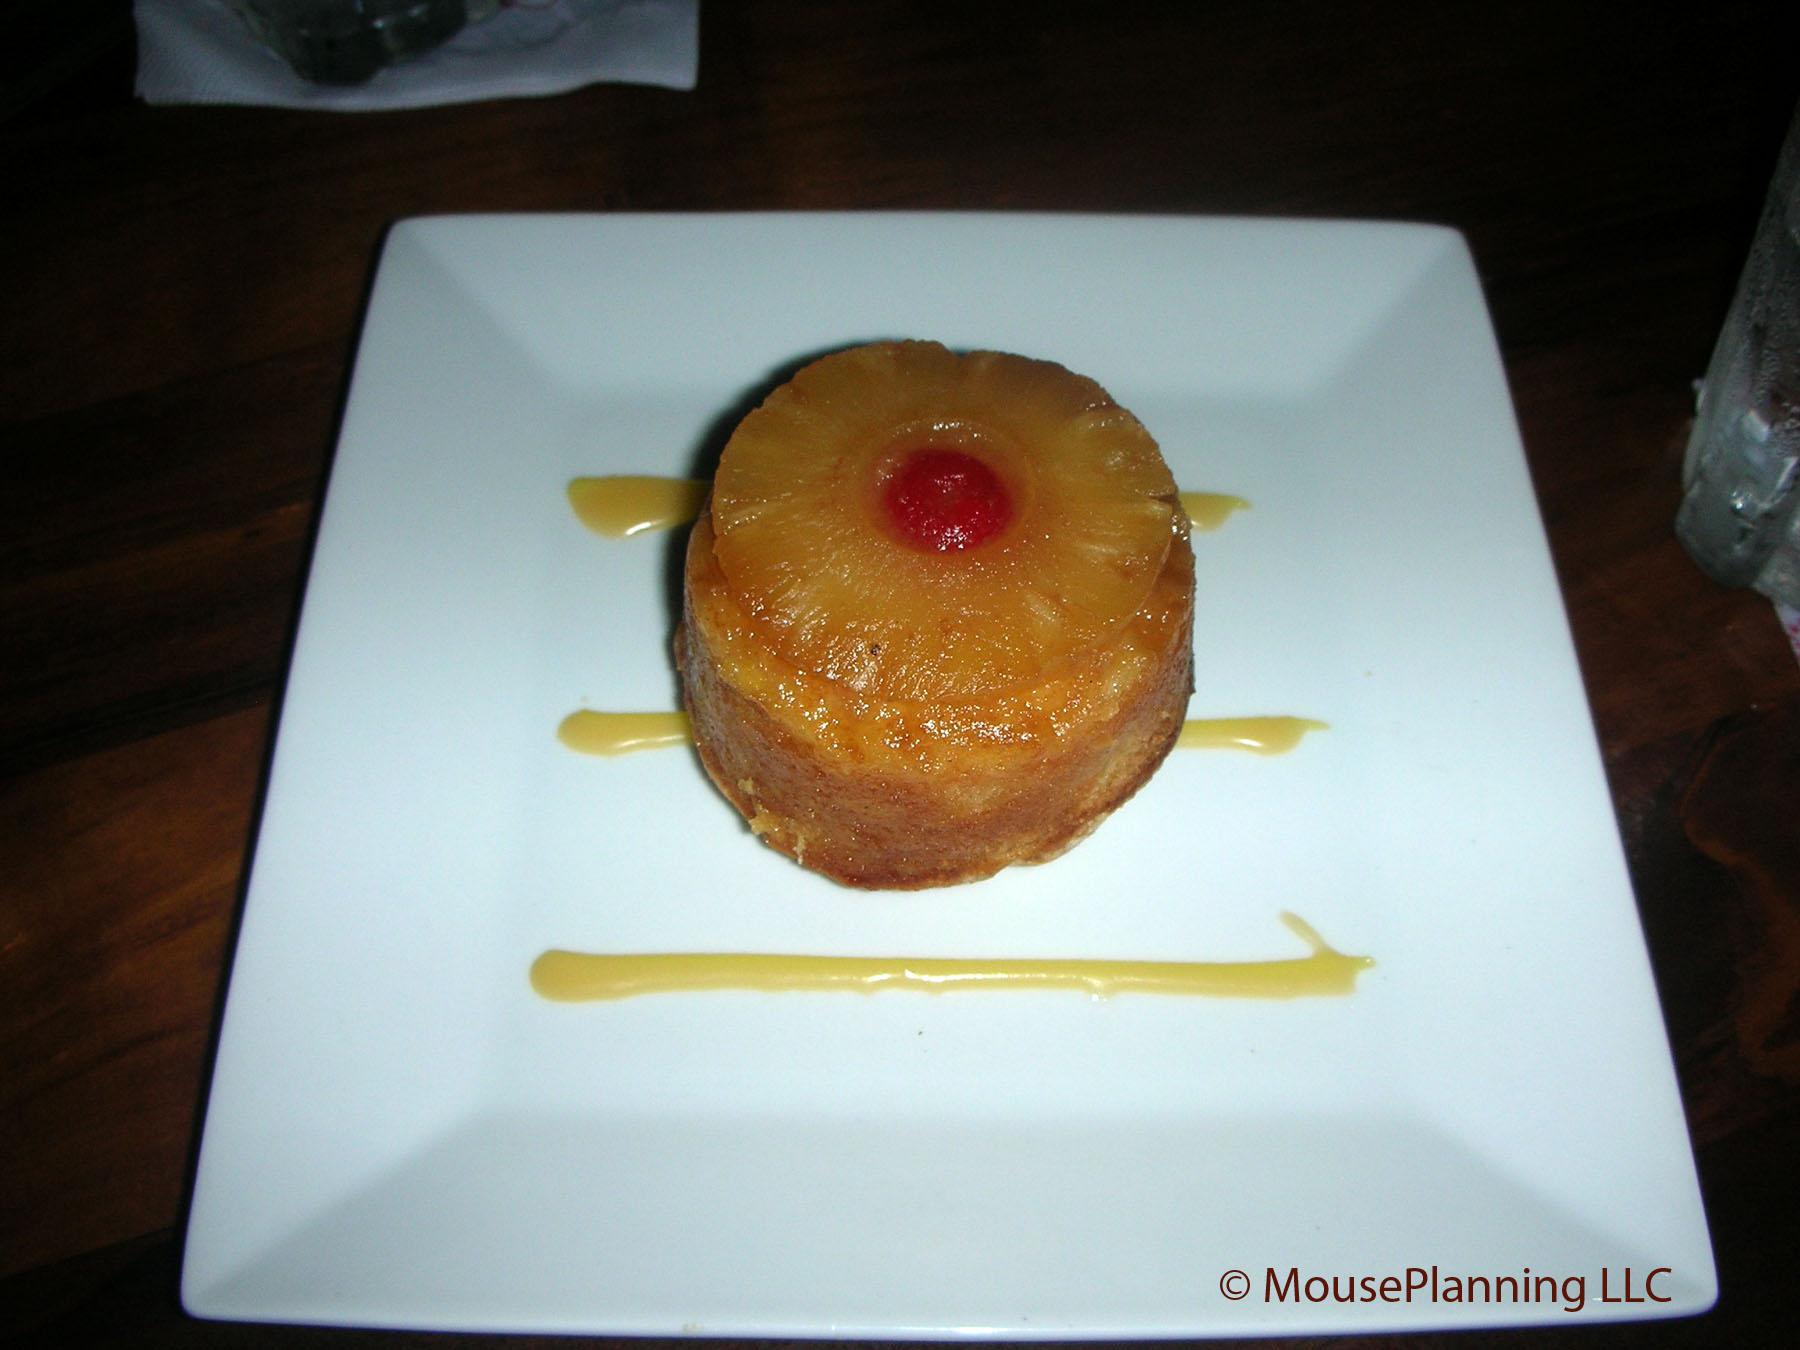 Kona Cafe Dessert - Pineapple Upside Down Cake